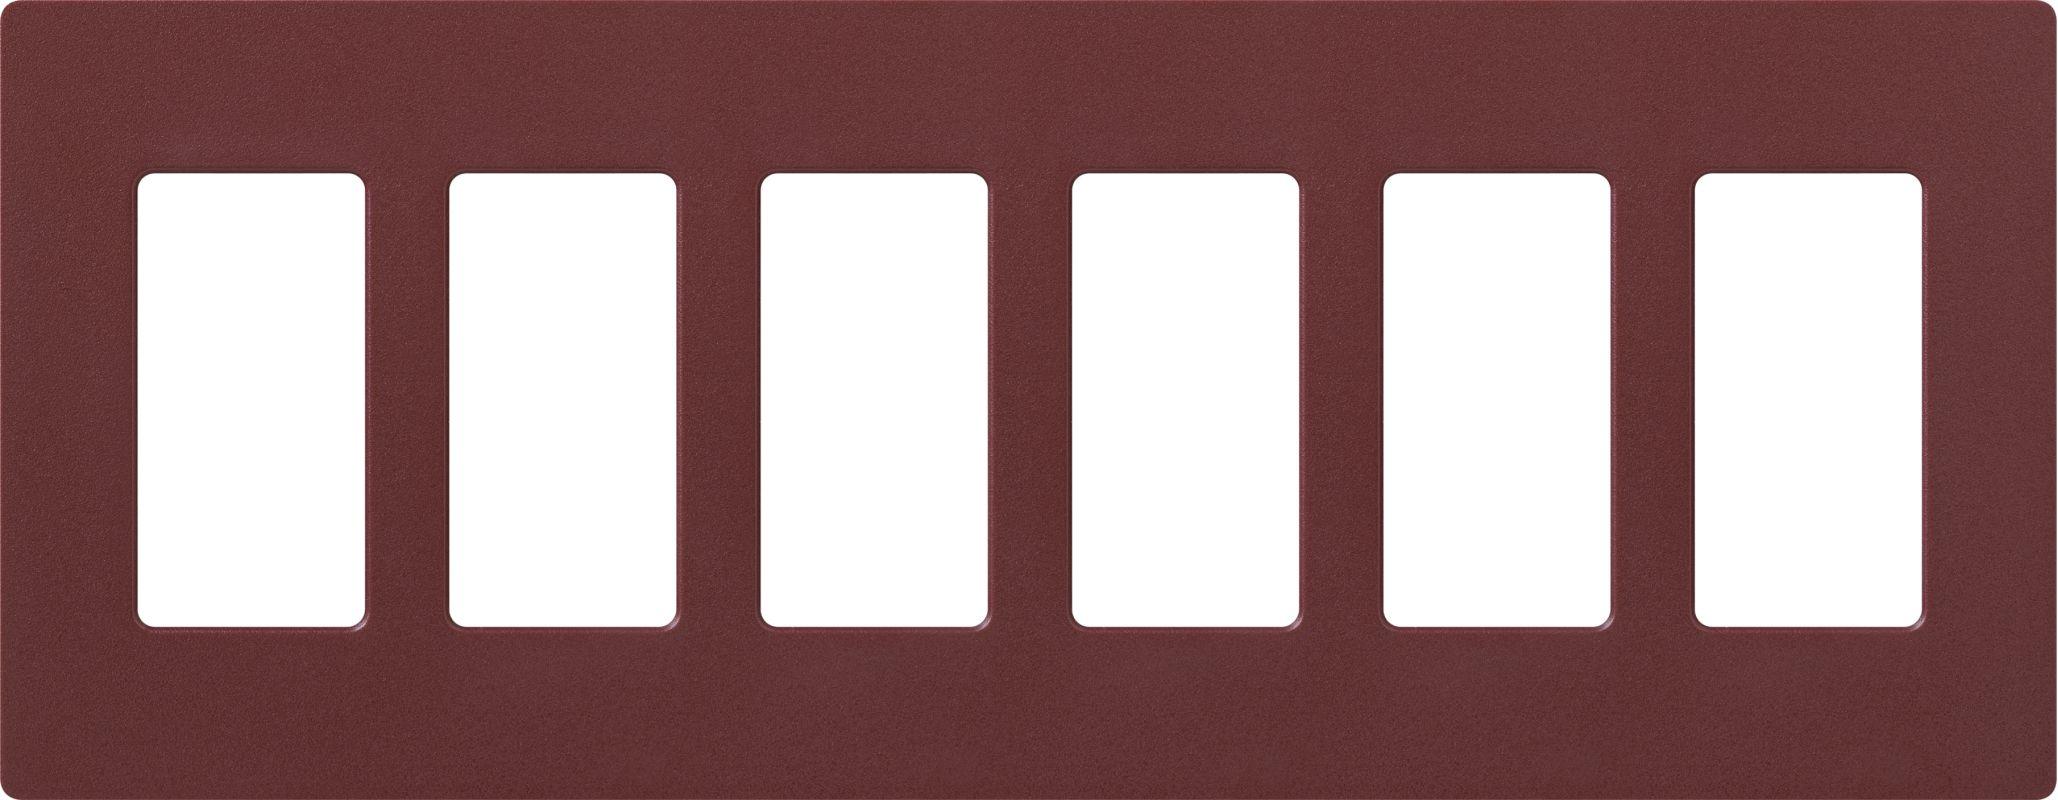 Lutron CW-6 Claro Six Gang Designer Wall Plate Merlot Wall Controls